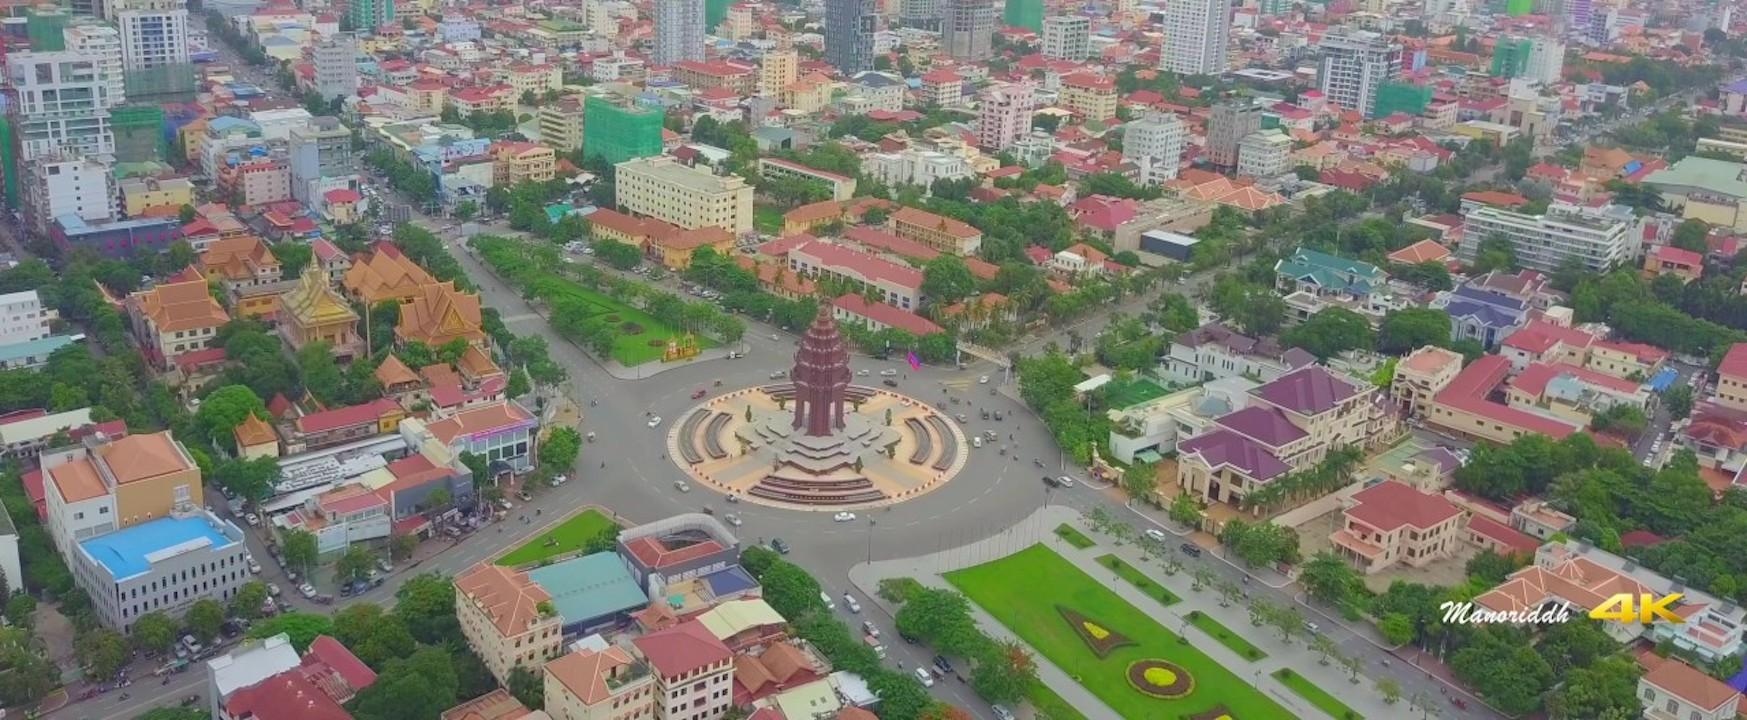 4 Day Phnom Penh Free & Easy (DeLuxe) 01/04/18 <> 15/09/18